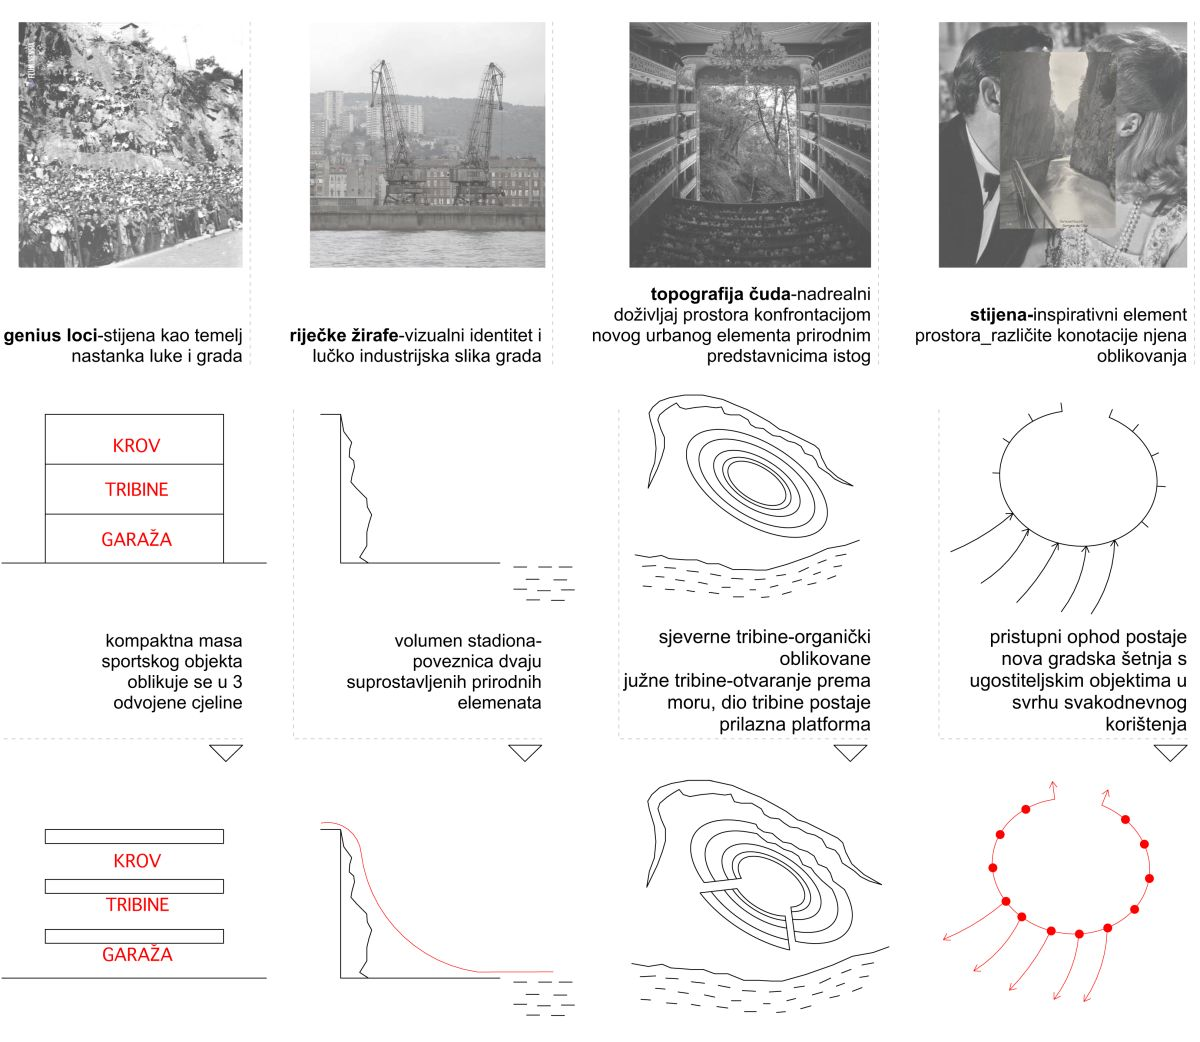 arhitektura-stadion-koncept